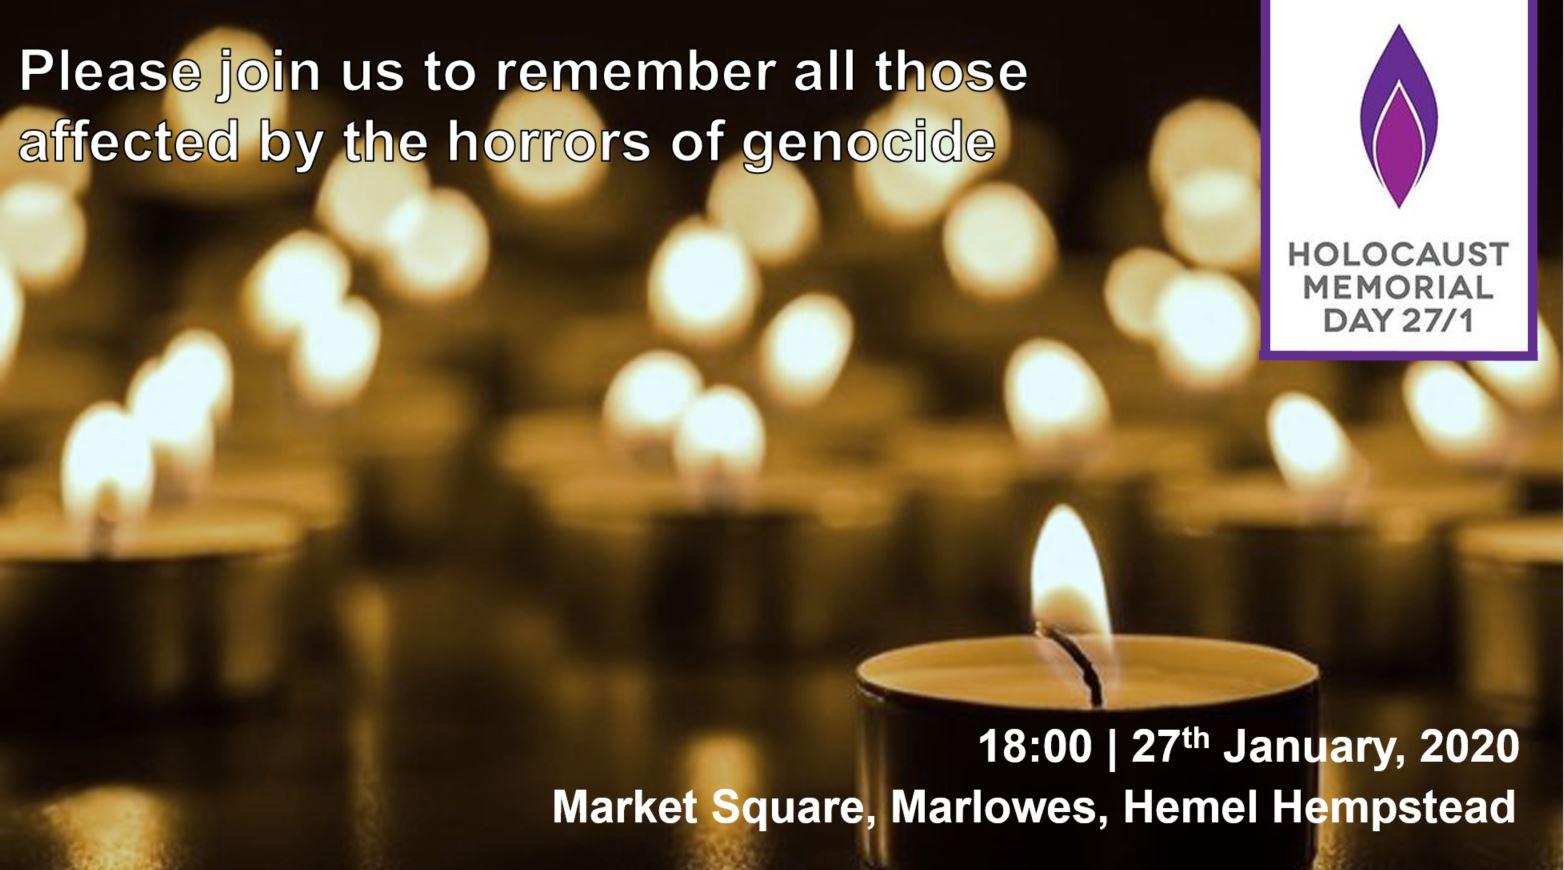 Holocaust Memorial Day Candle Vigil